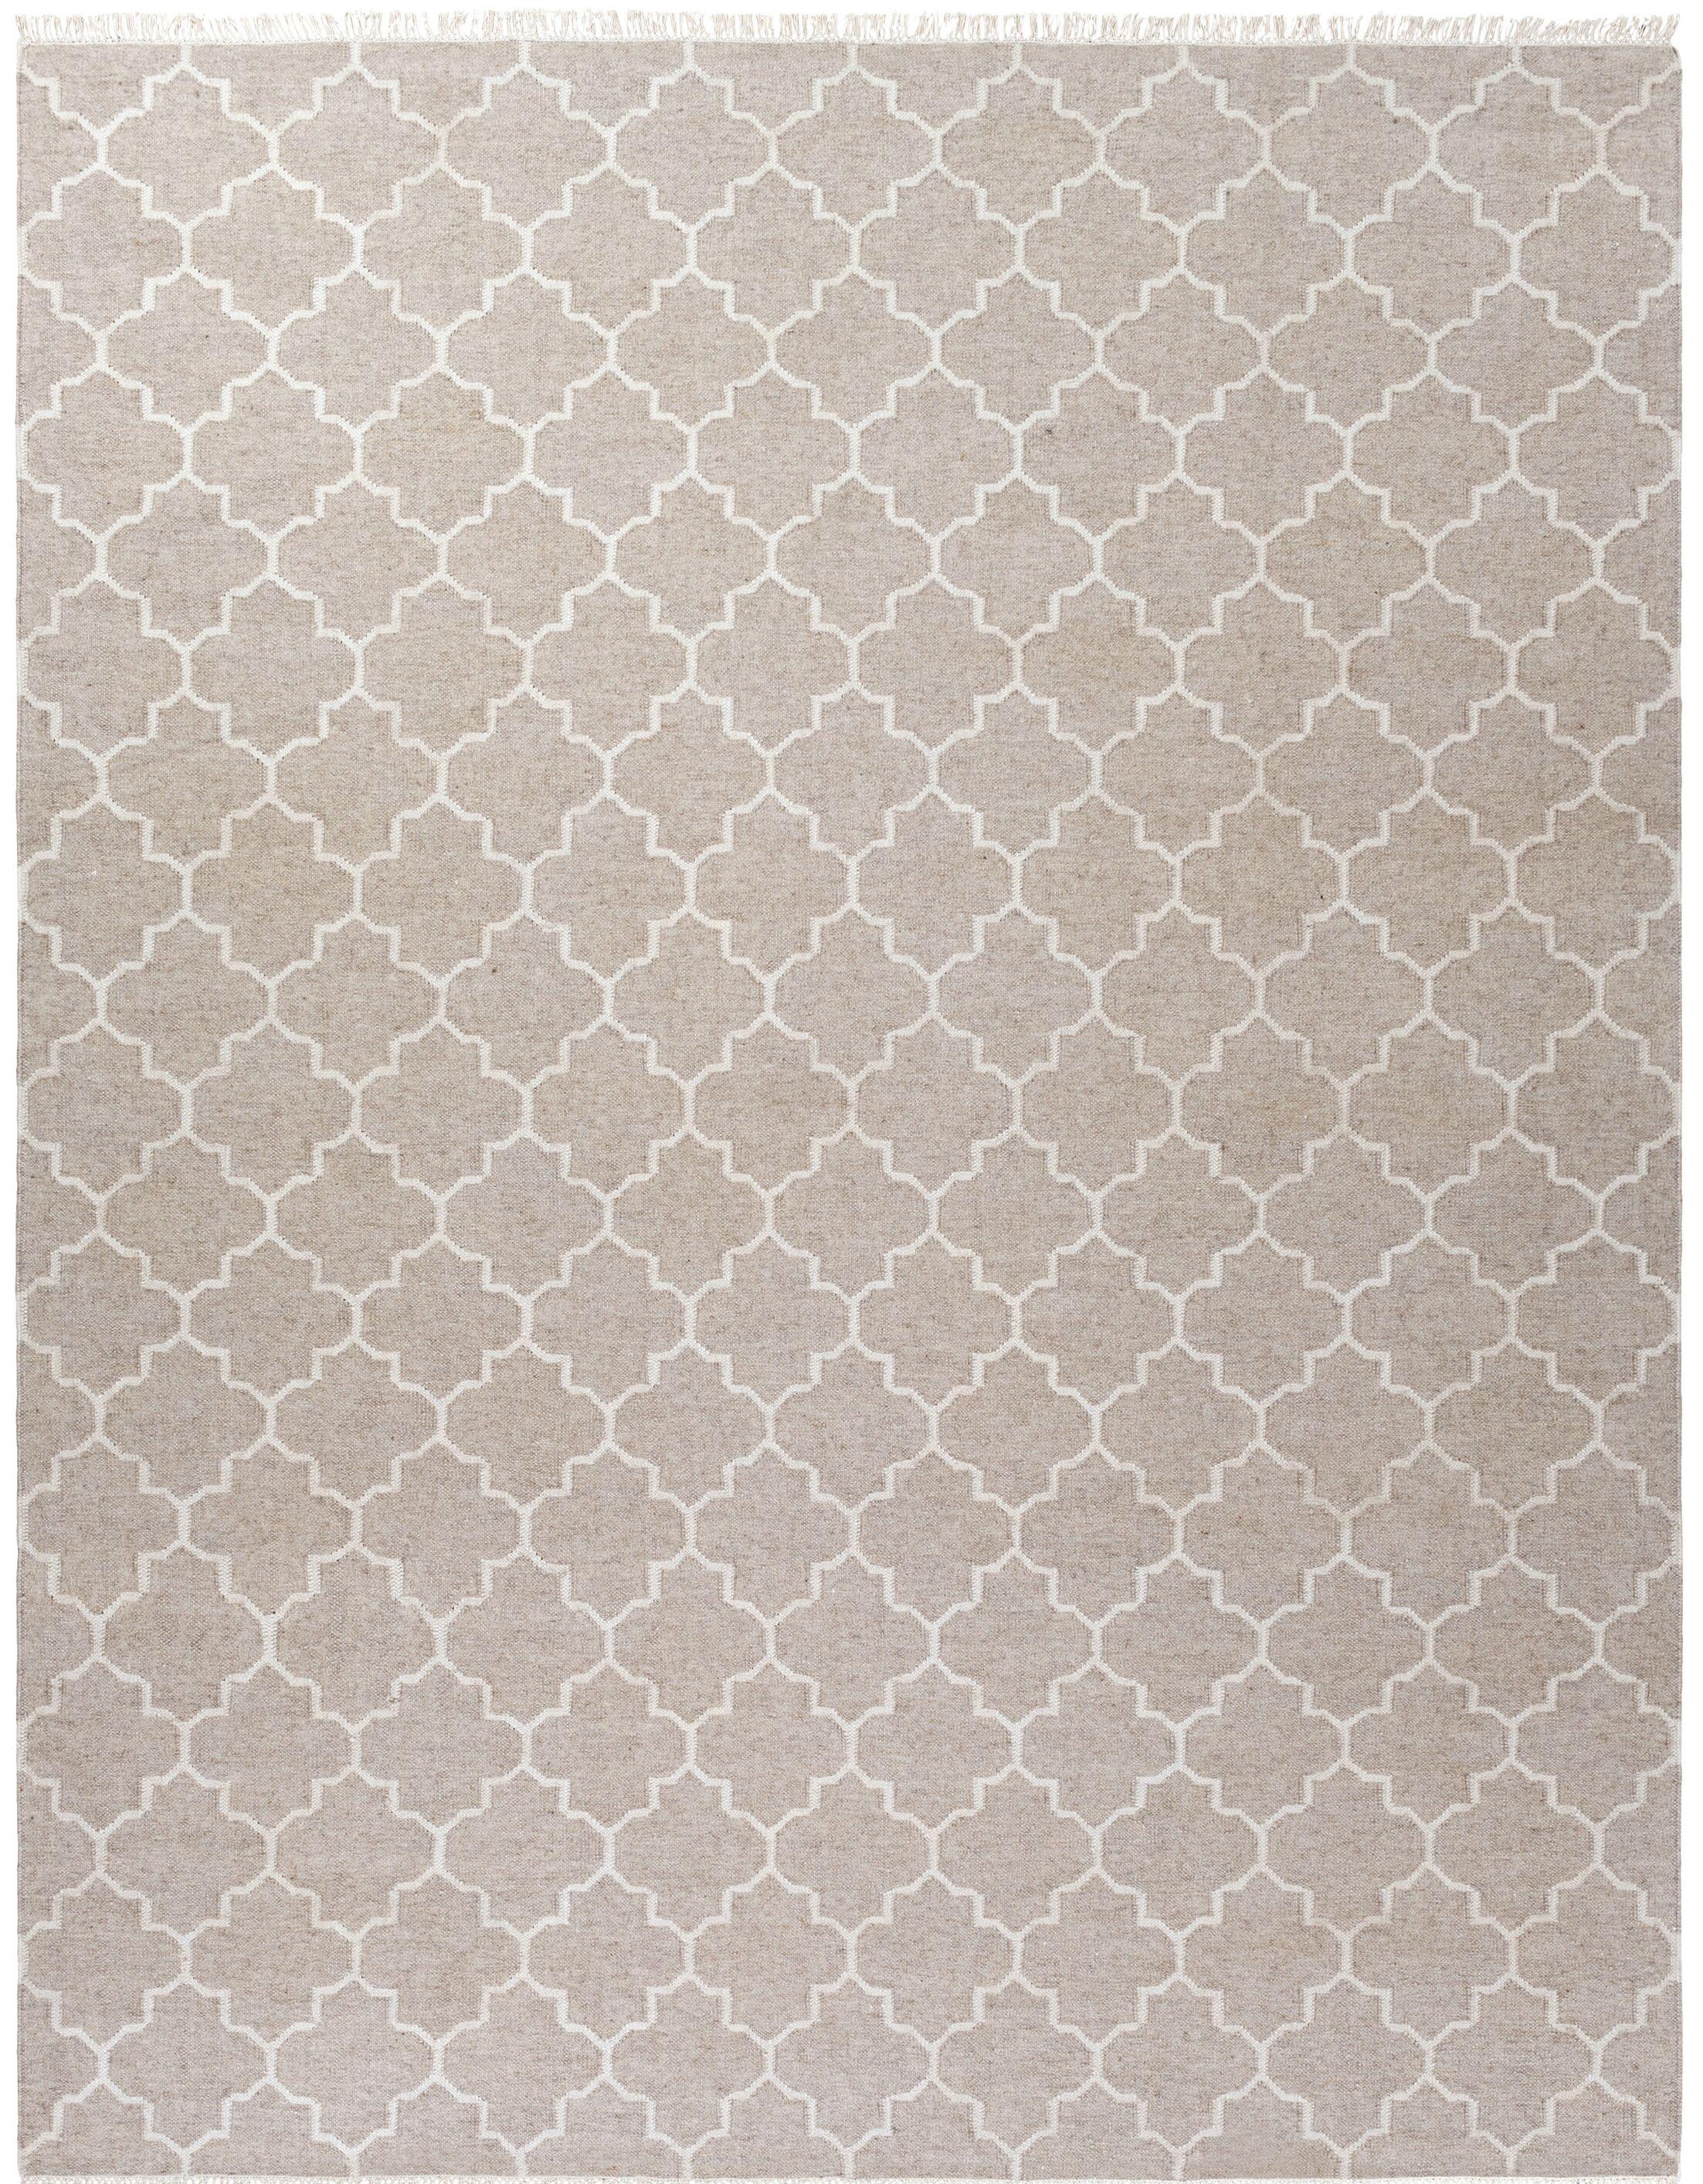 Palladio Hand-Woven Gray Area Rug Rug Size: Rectangle 8' x 10'